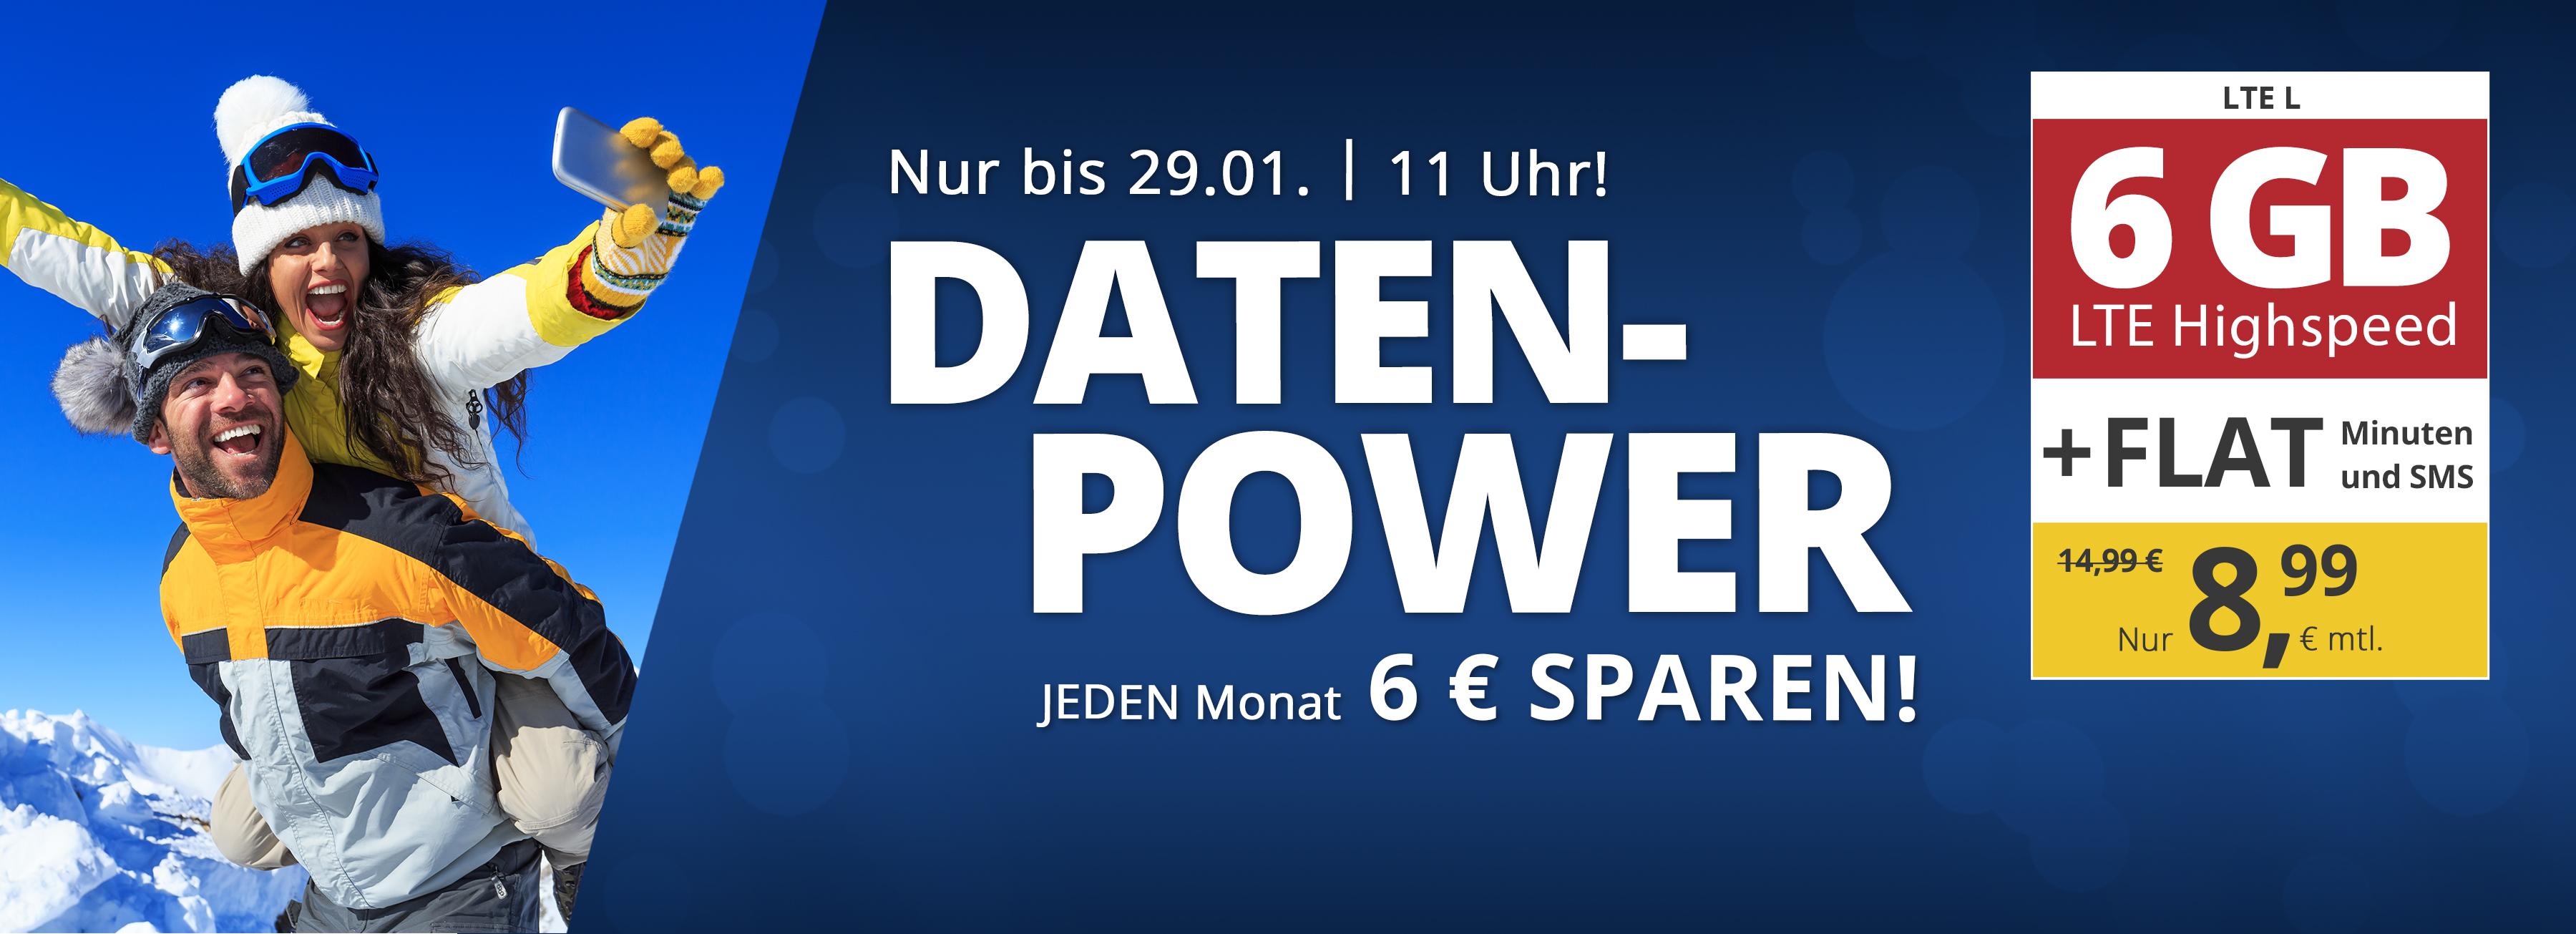 DATEN-POWER